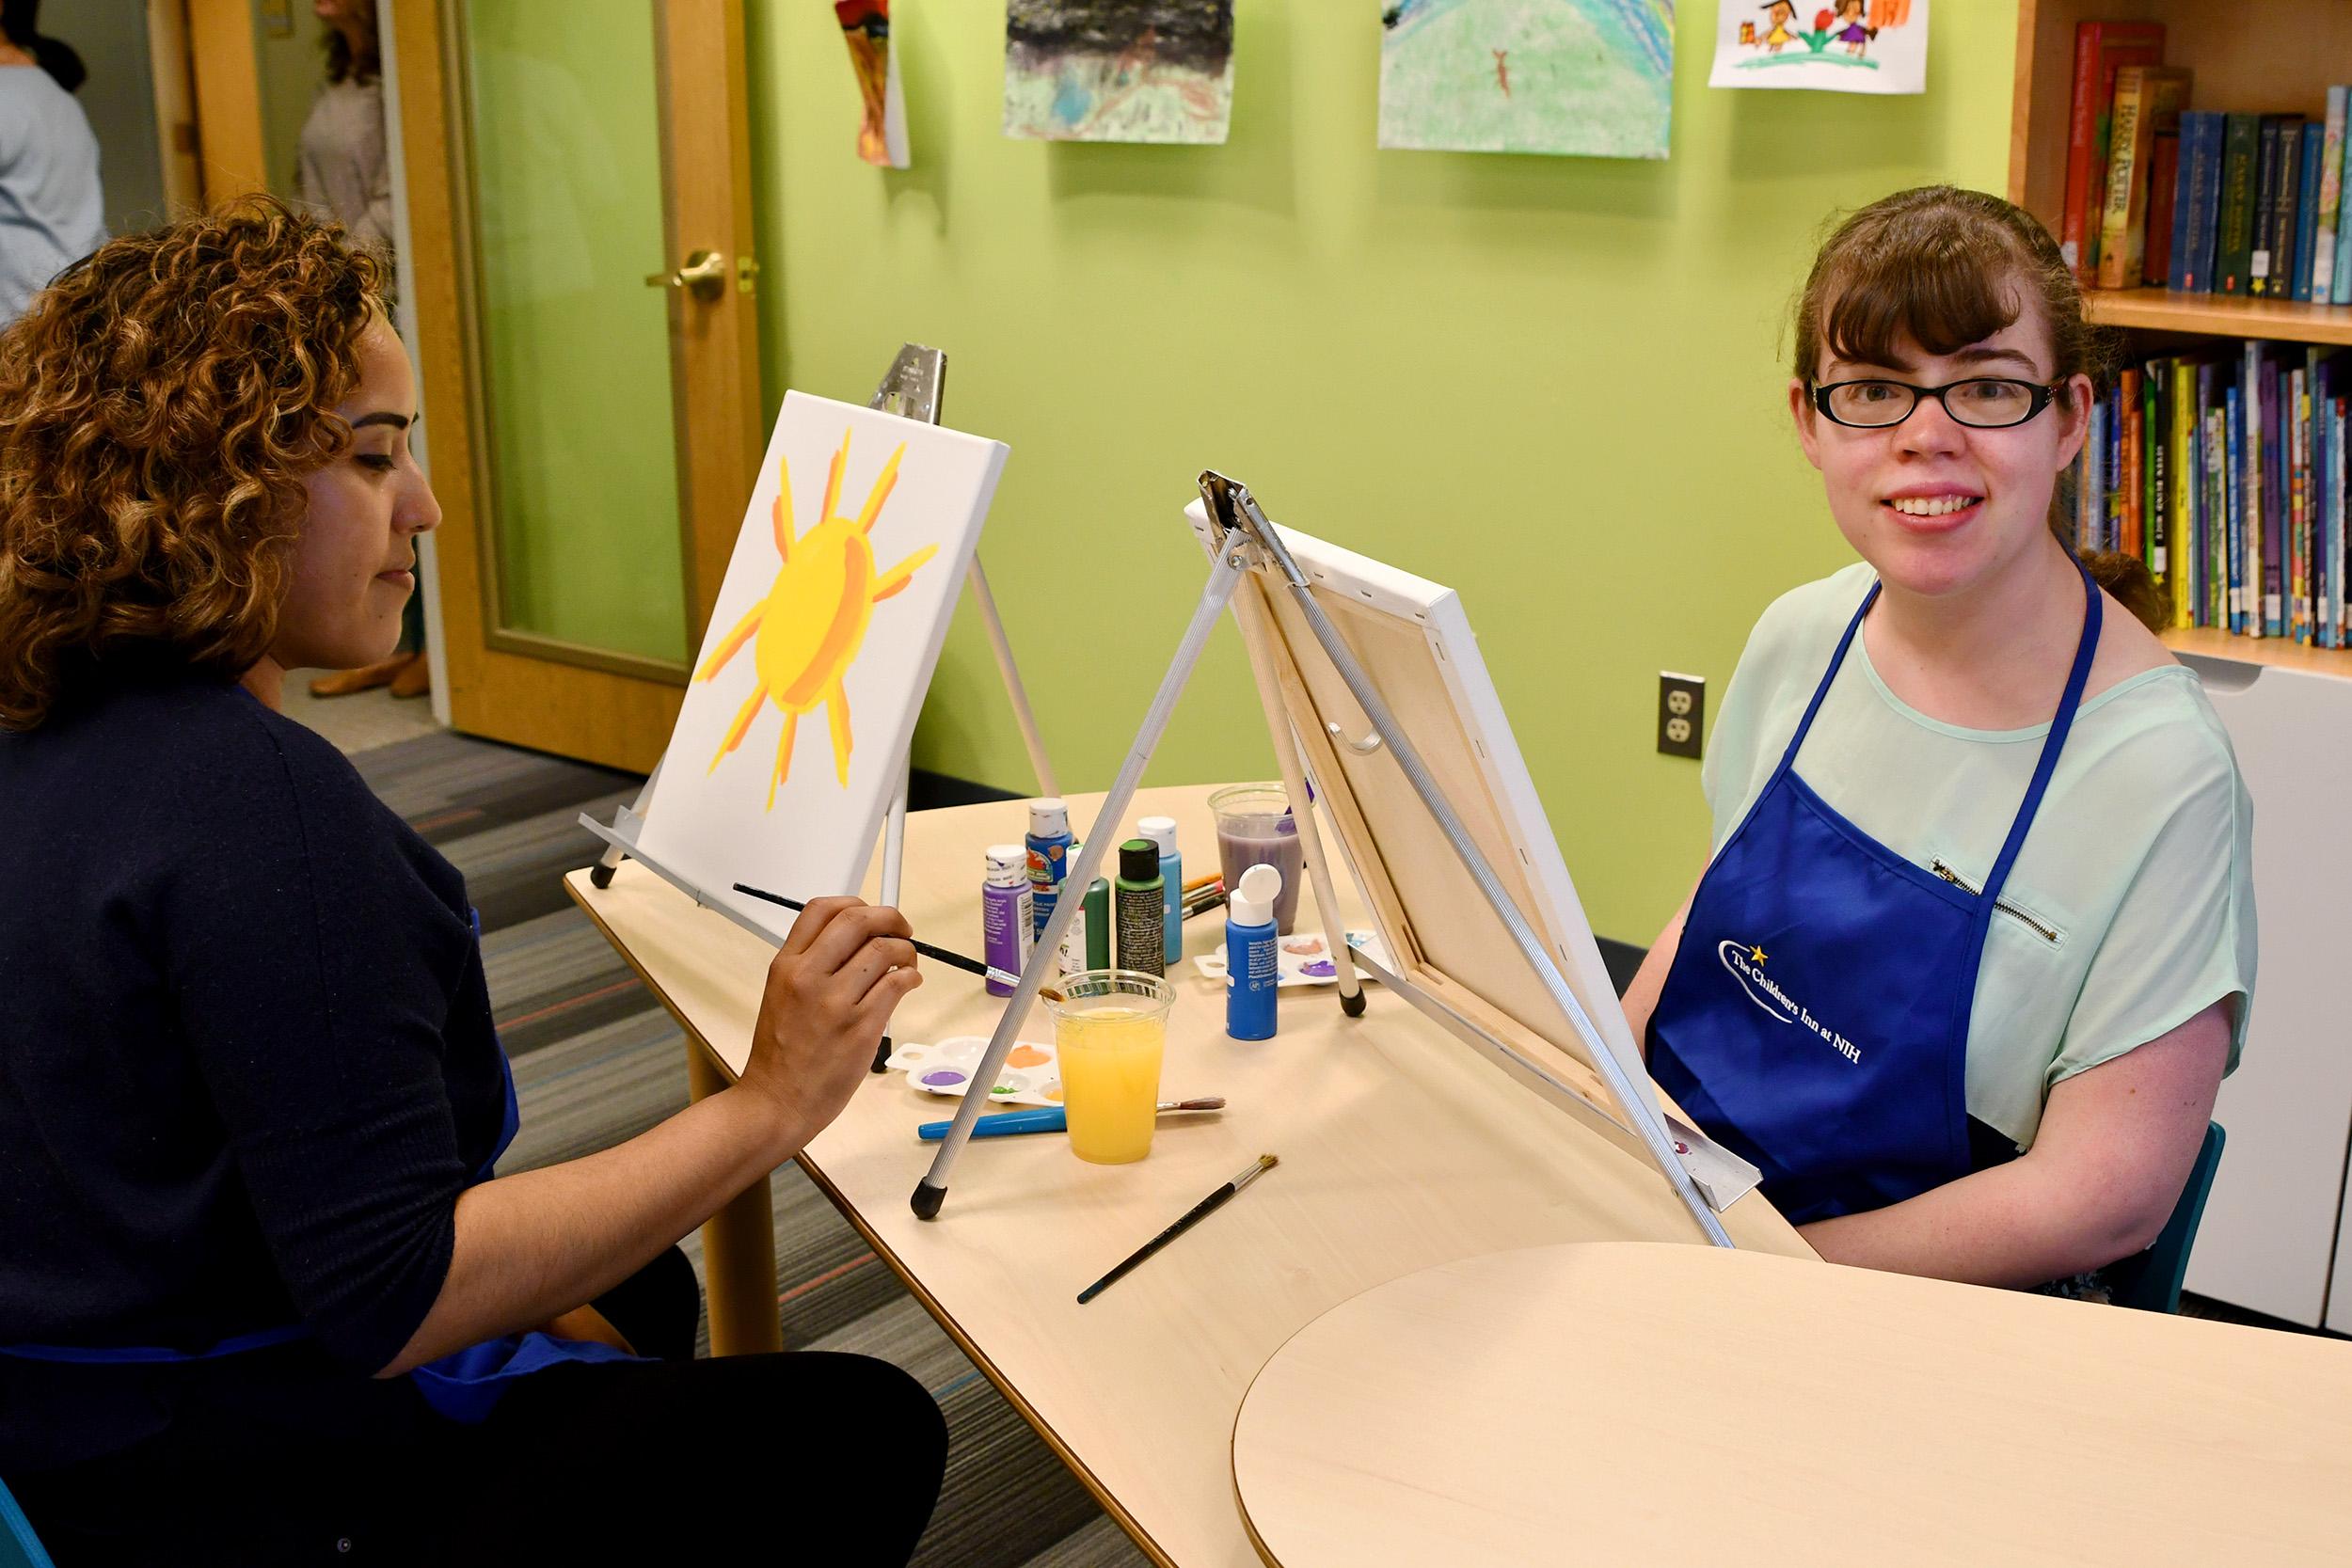 Tina paints with Lidia, an Inn staff member